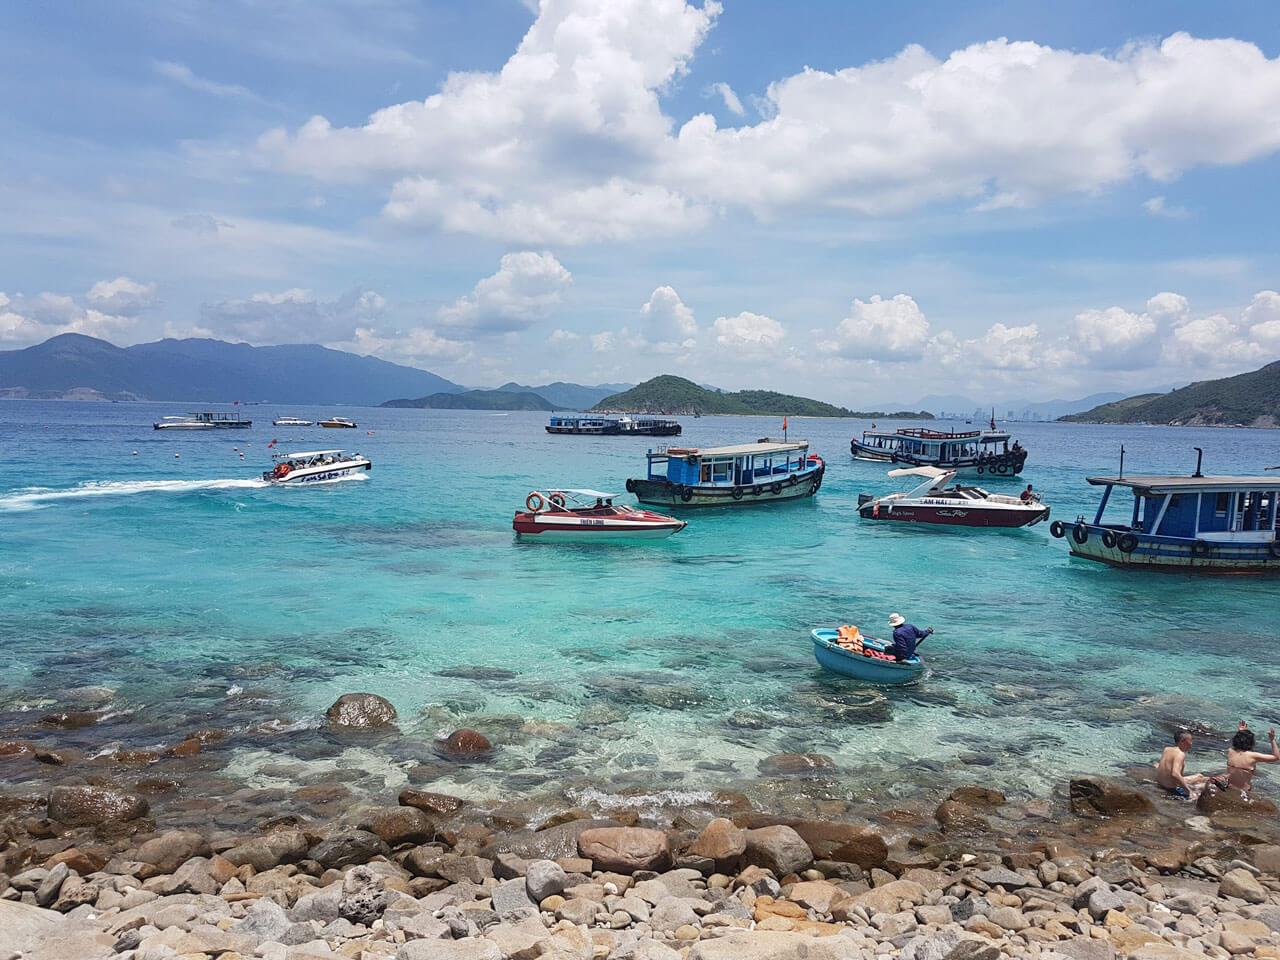 Hong Mun Island